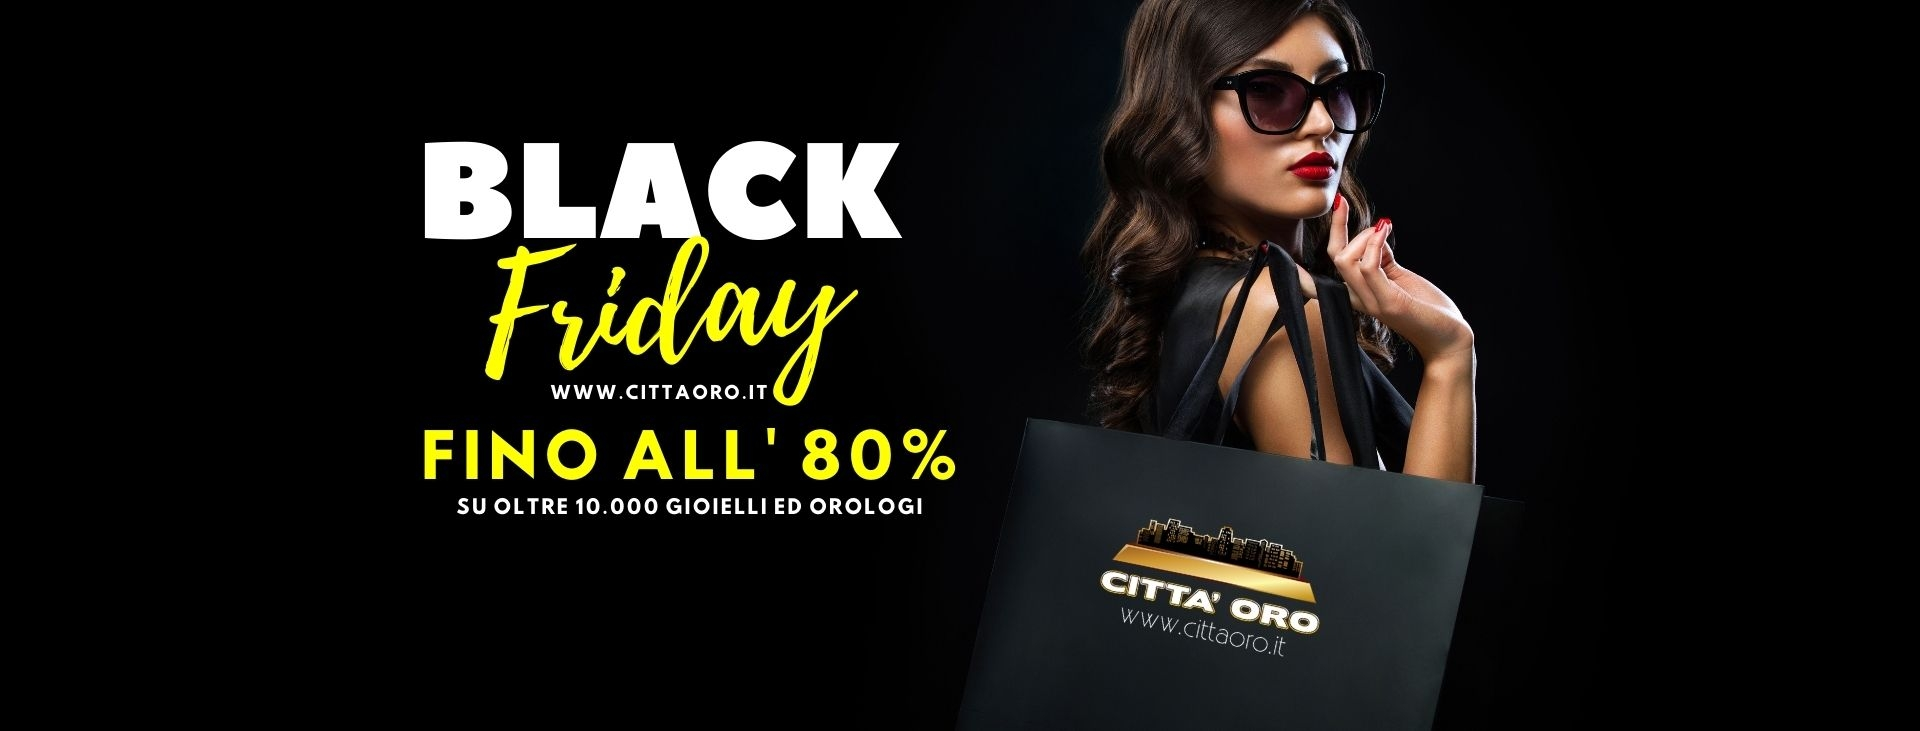 OFFERTE BLACK FRIDAY CITTAORO